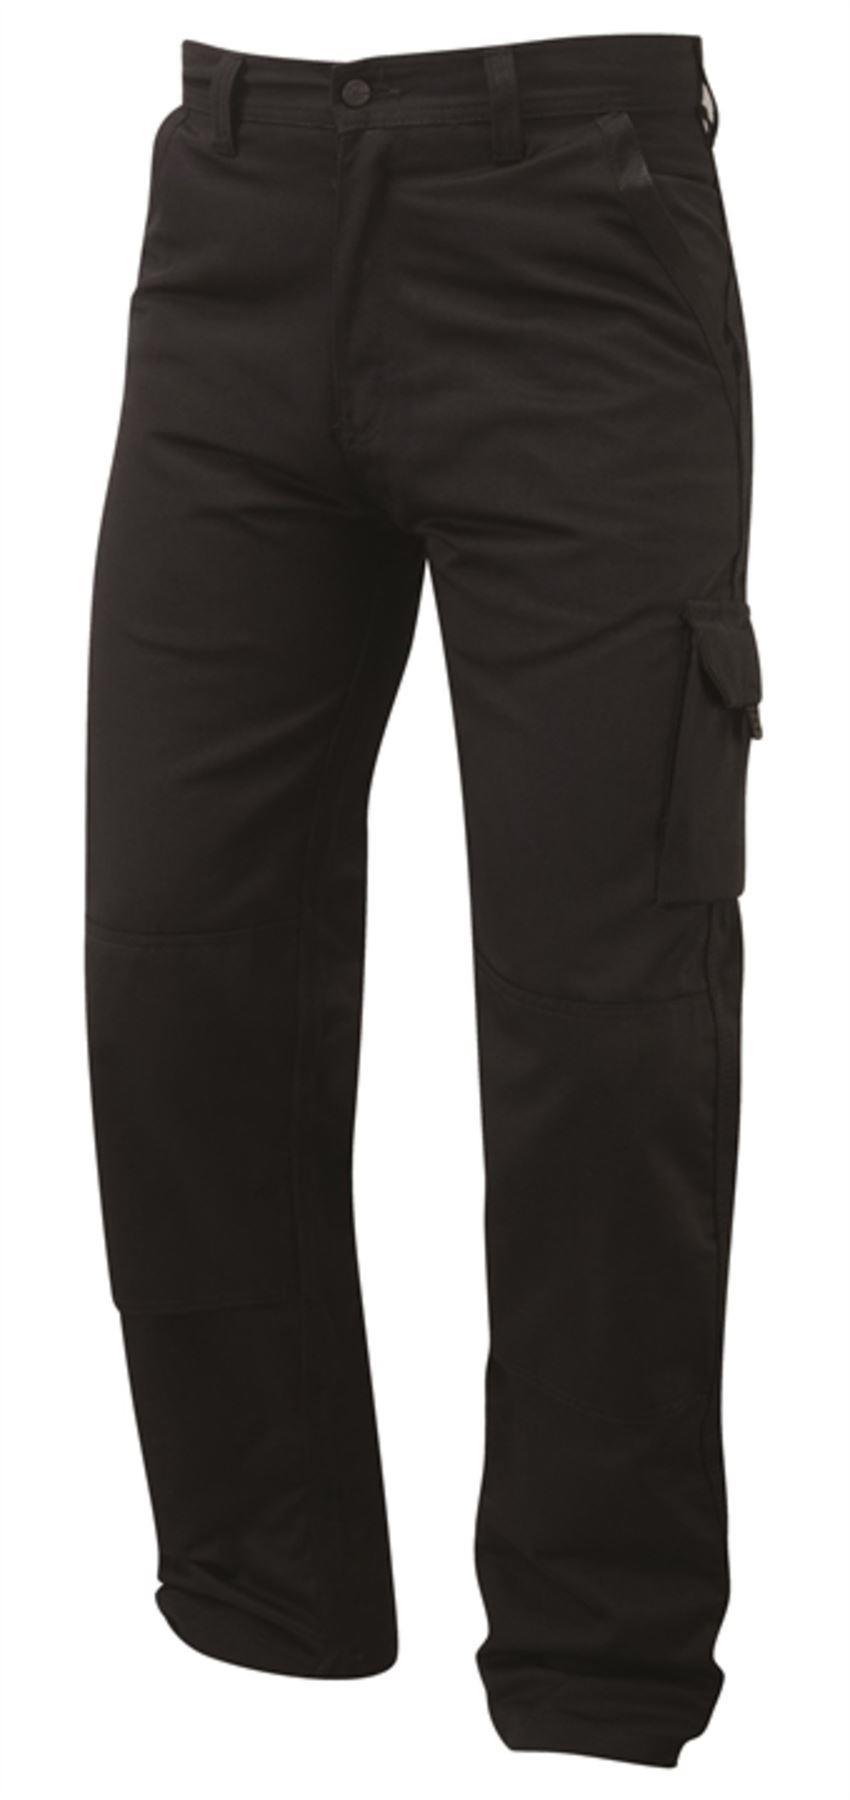 Orn Heron Kneepad Combat Trousers - Black|42W35L